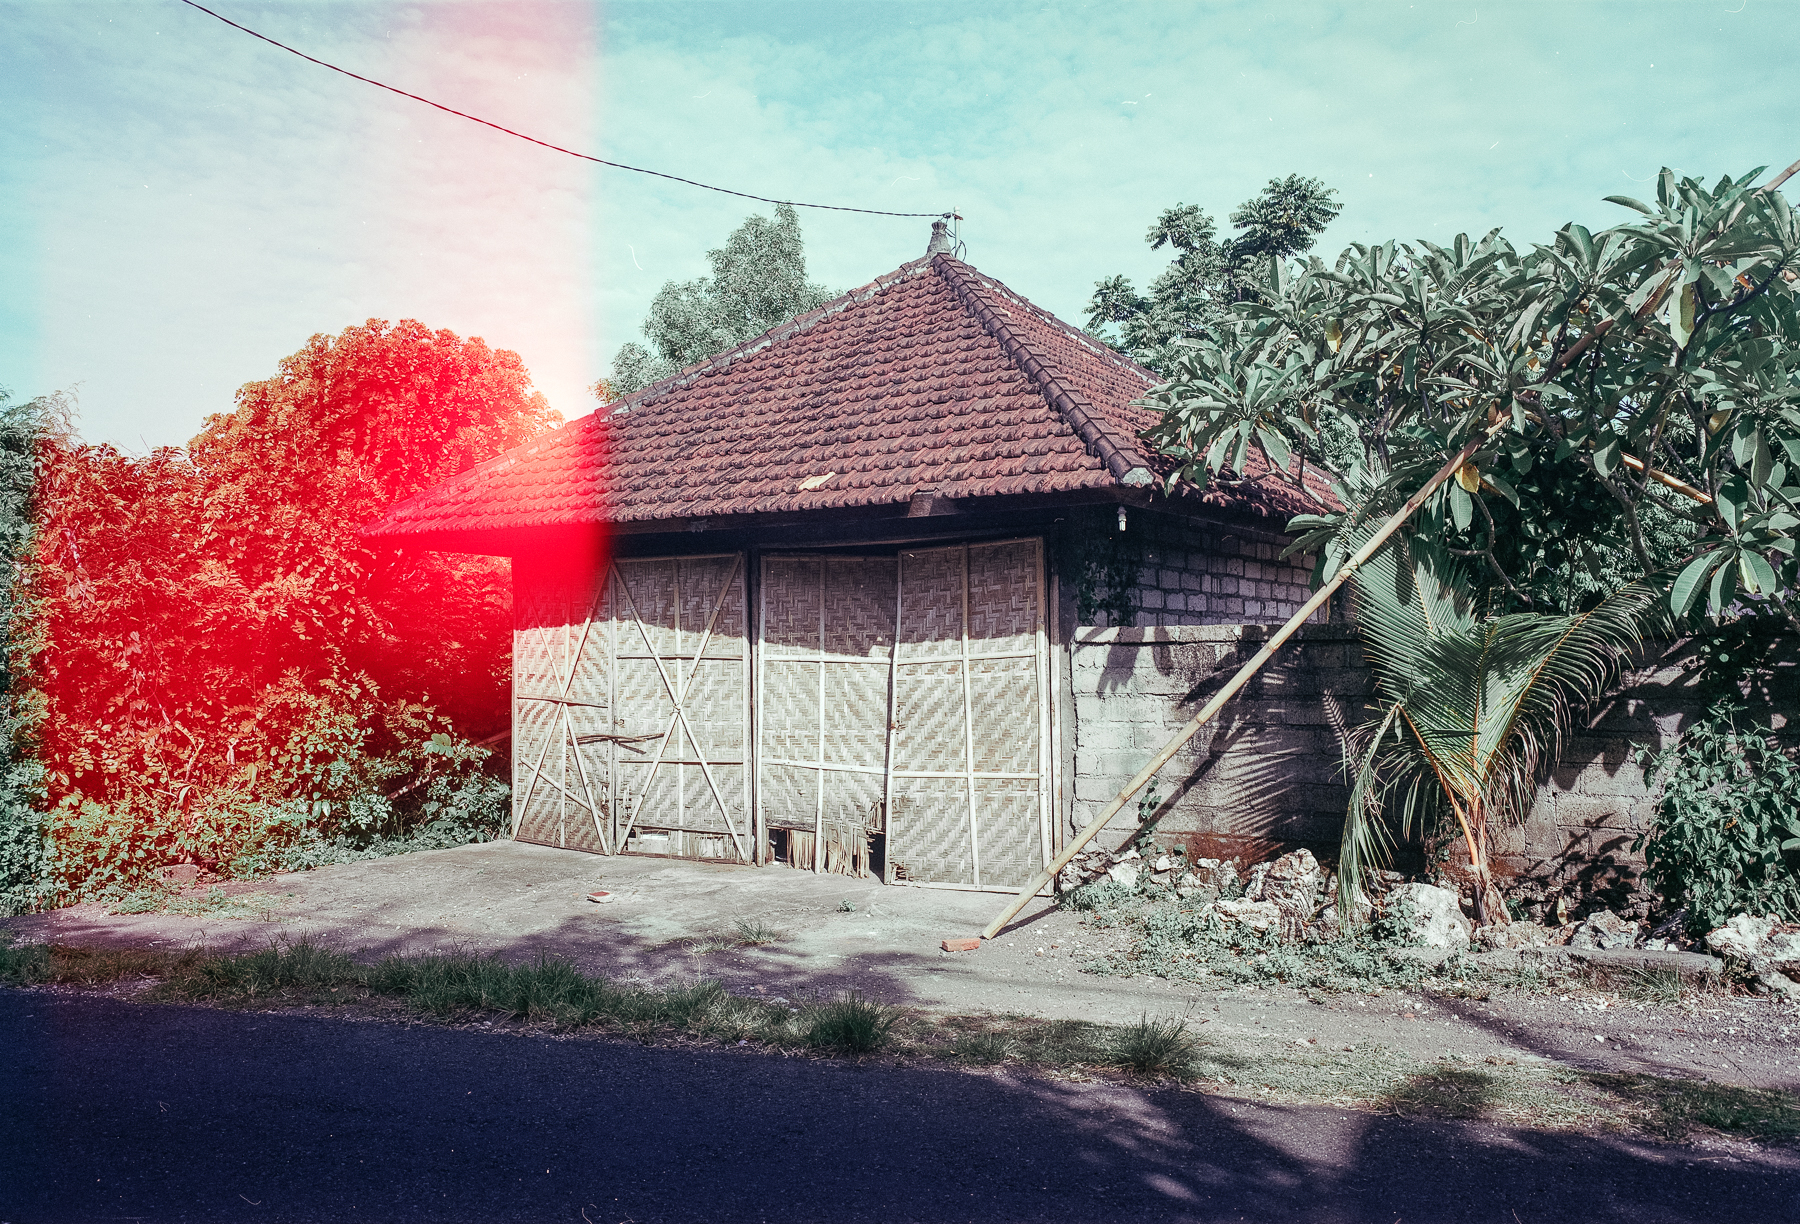 bali_120_colour-4